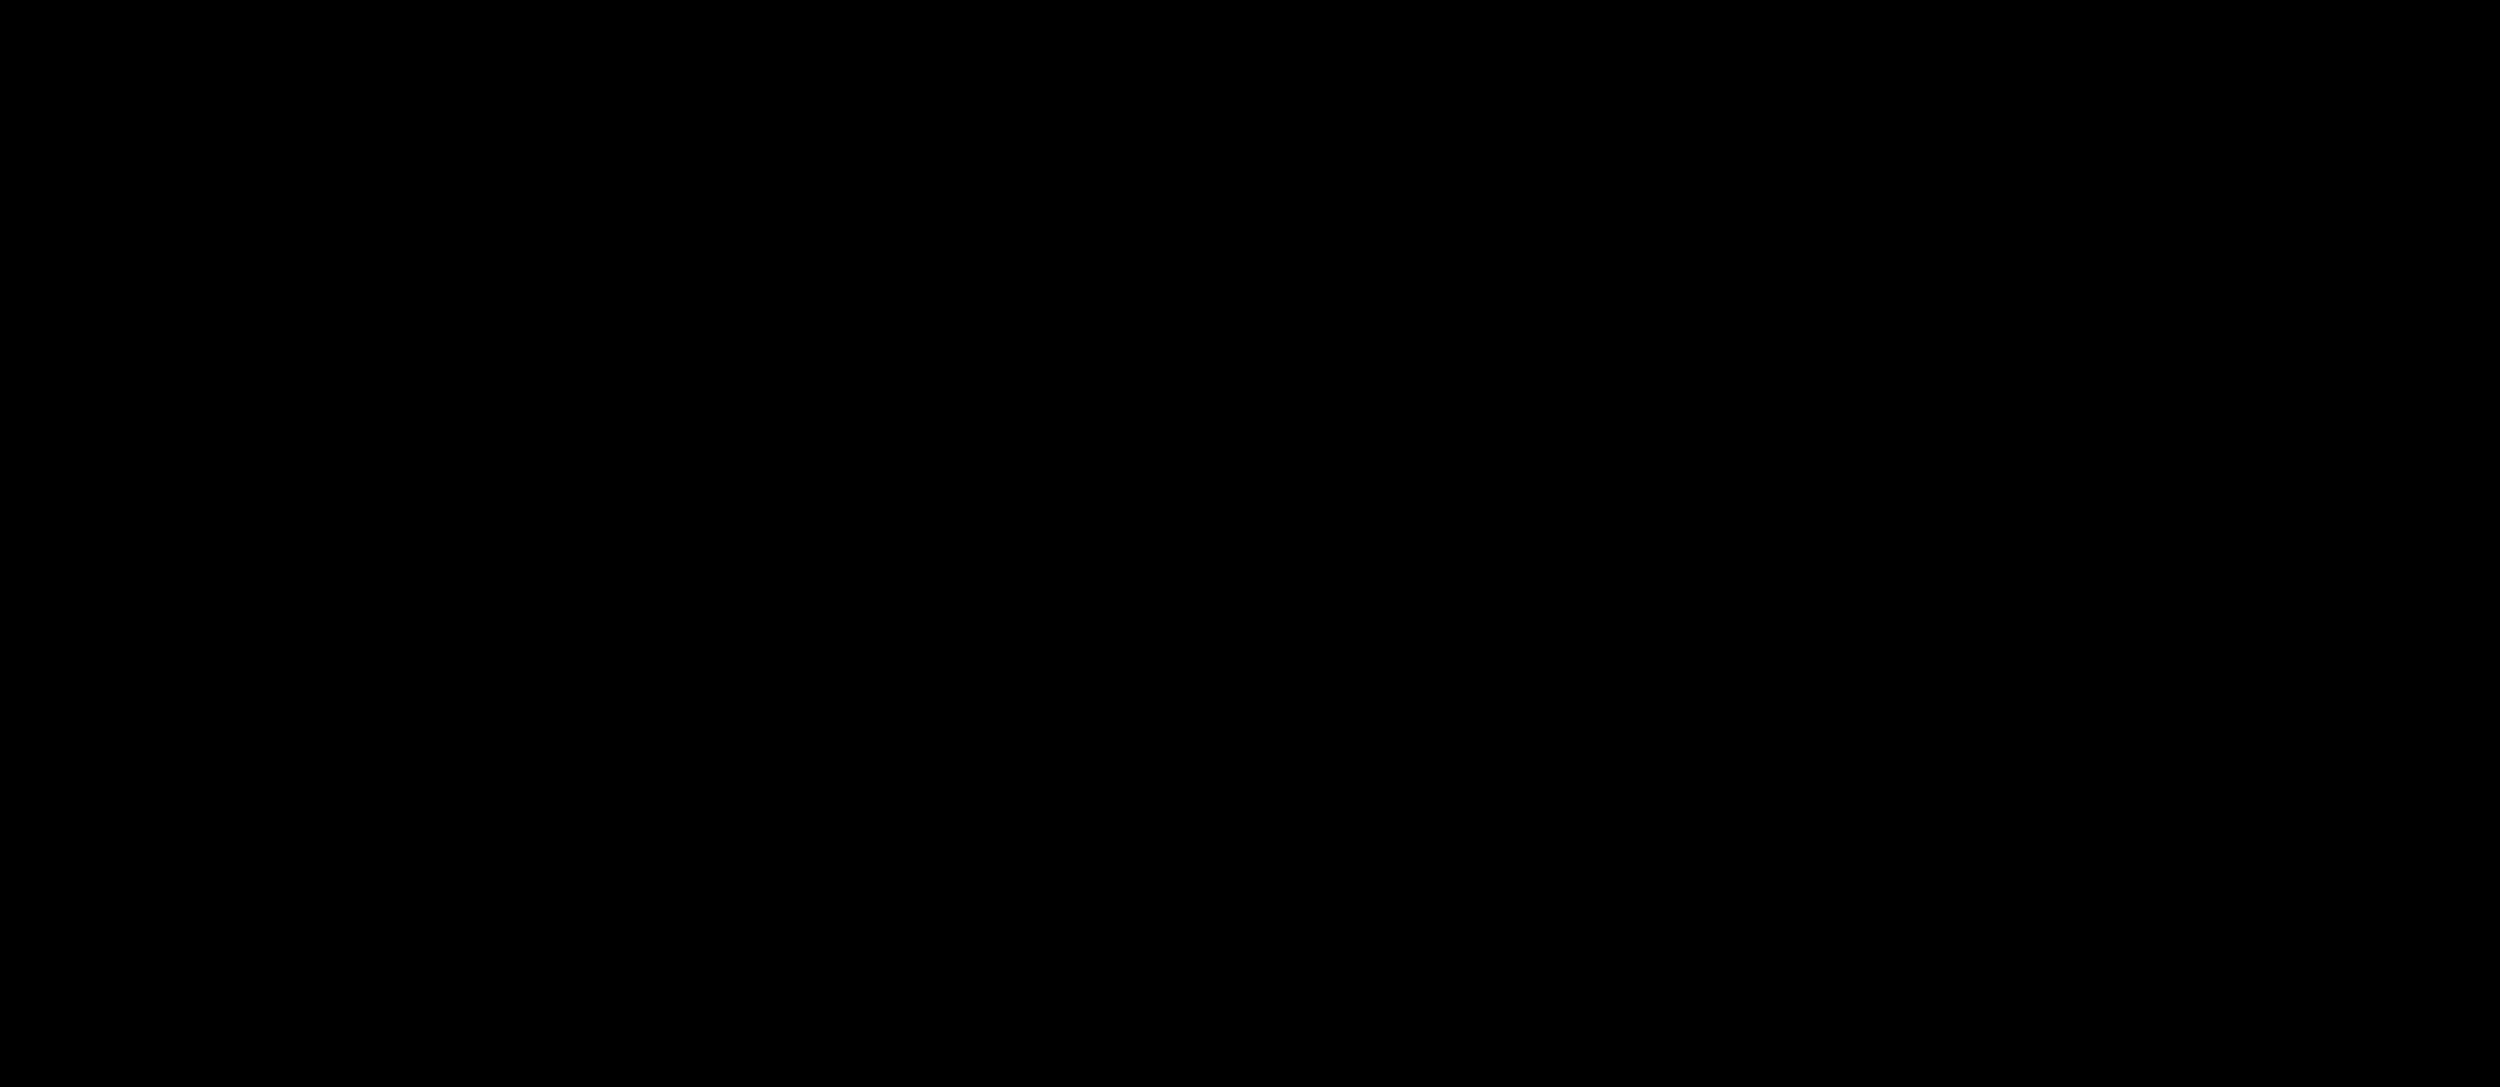 2020 Senior Spokesmodel Logo.png